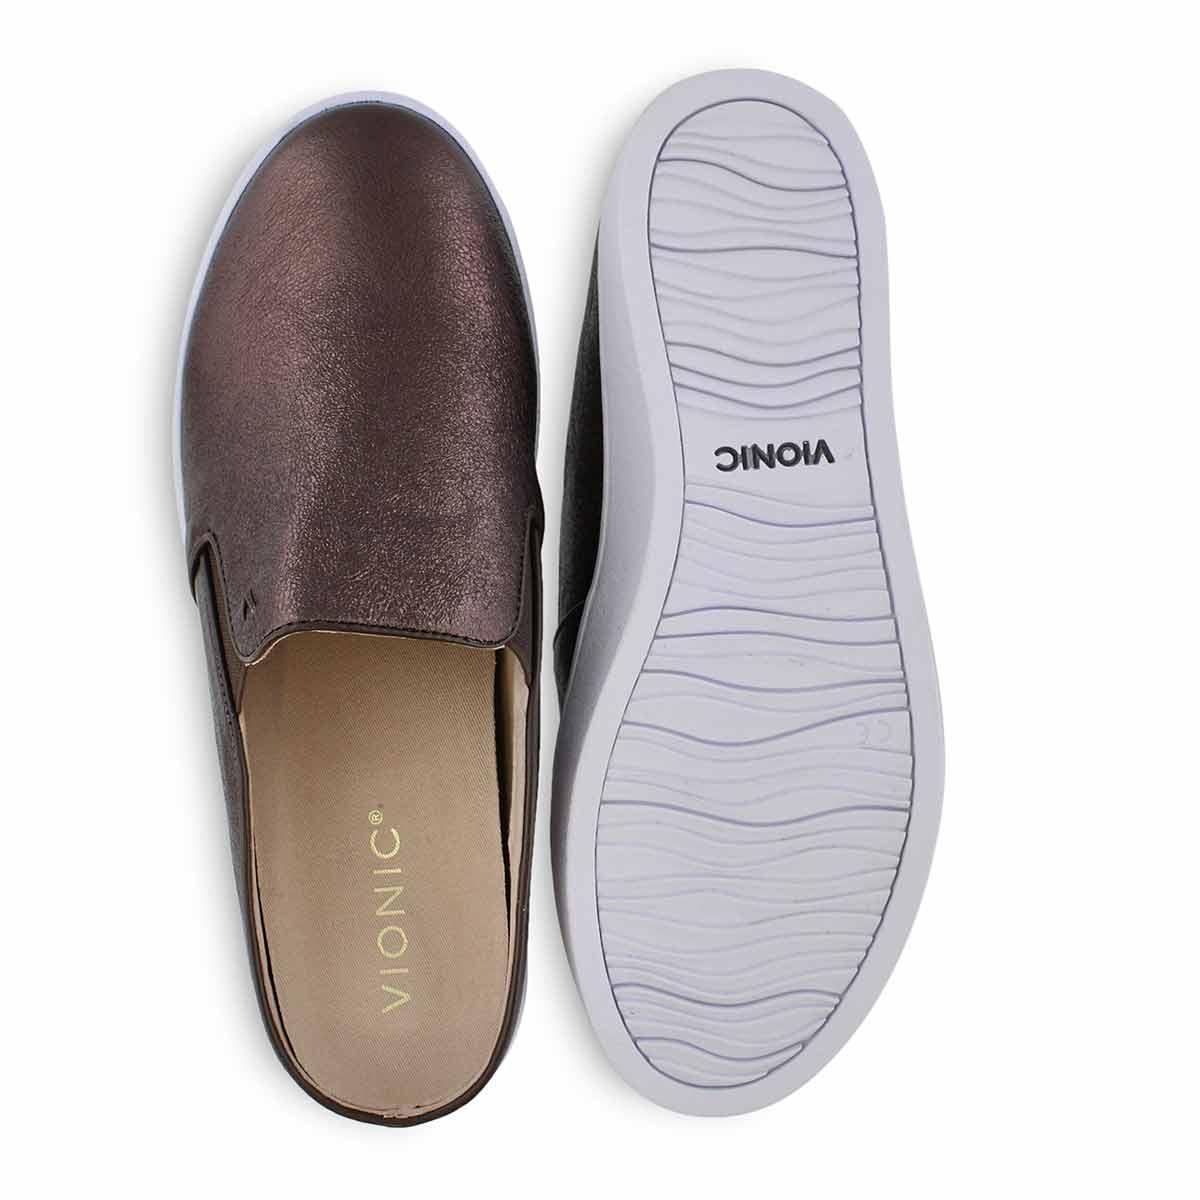 Lds Dakota brnz mtlc casual slip on shoe